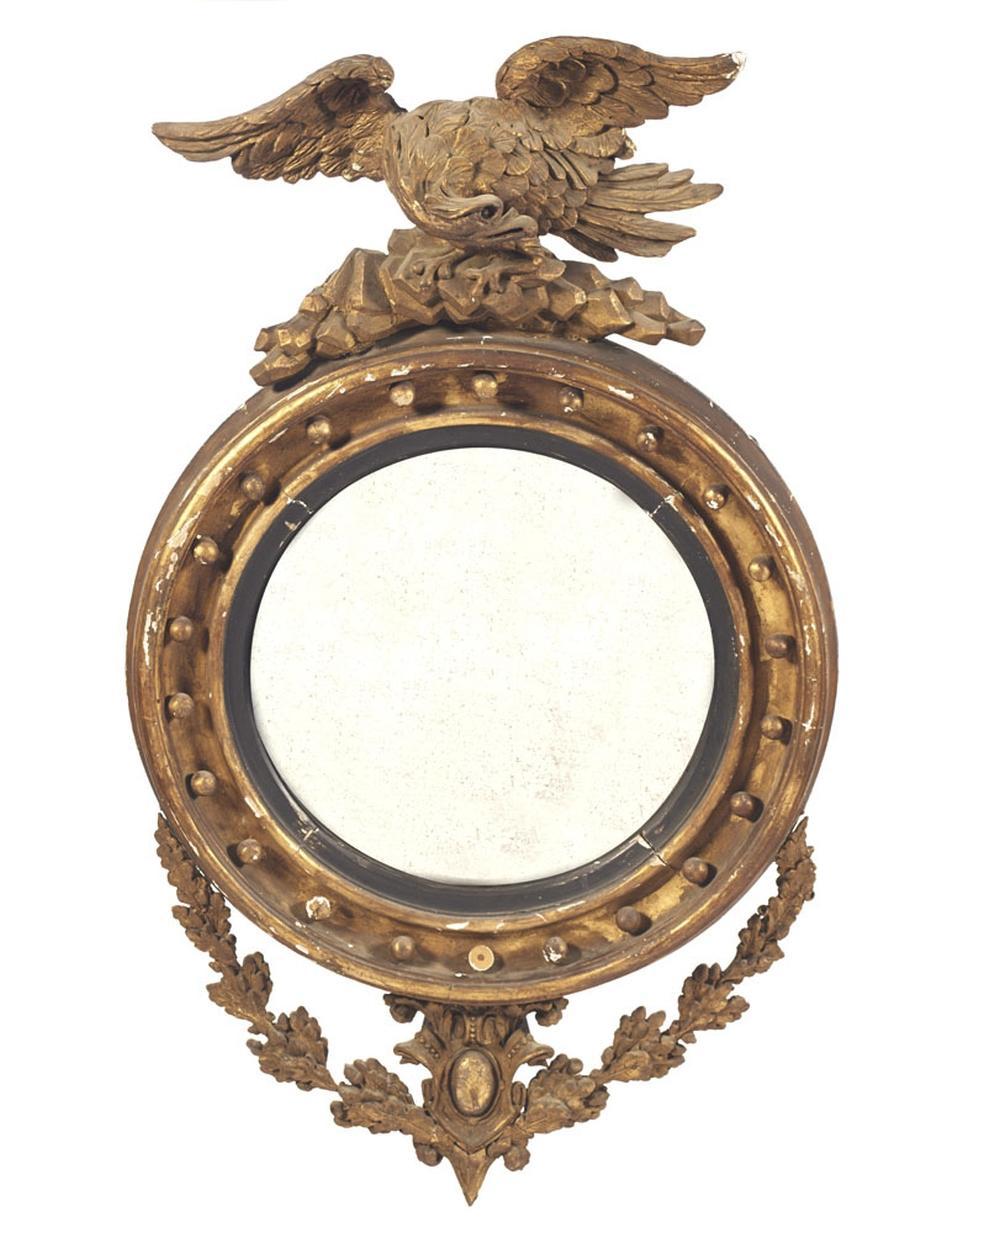 Espelho convexo de formato circular, Império